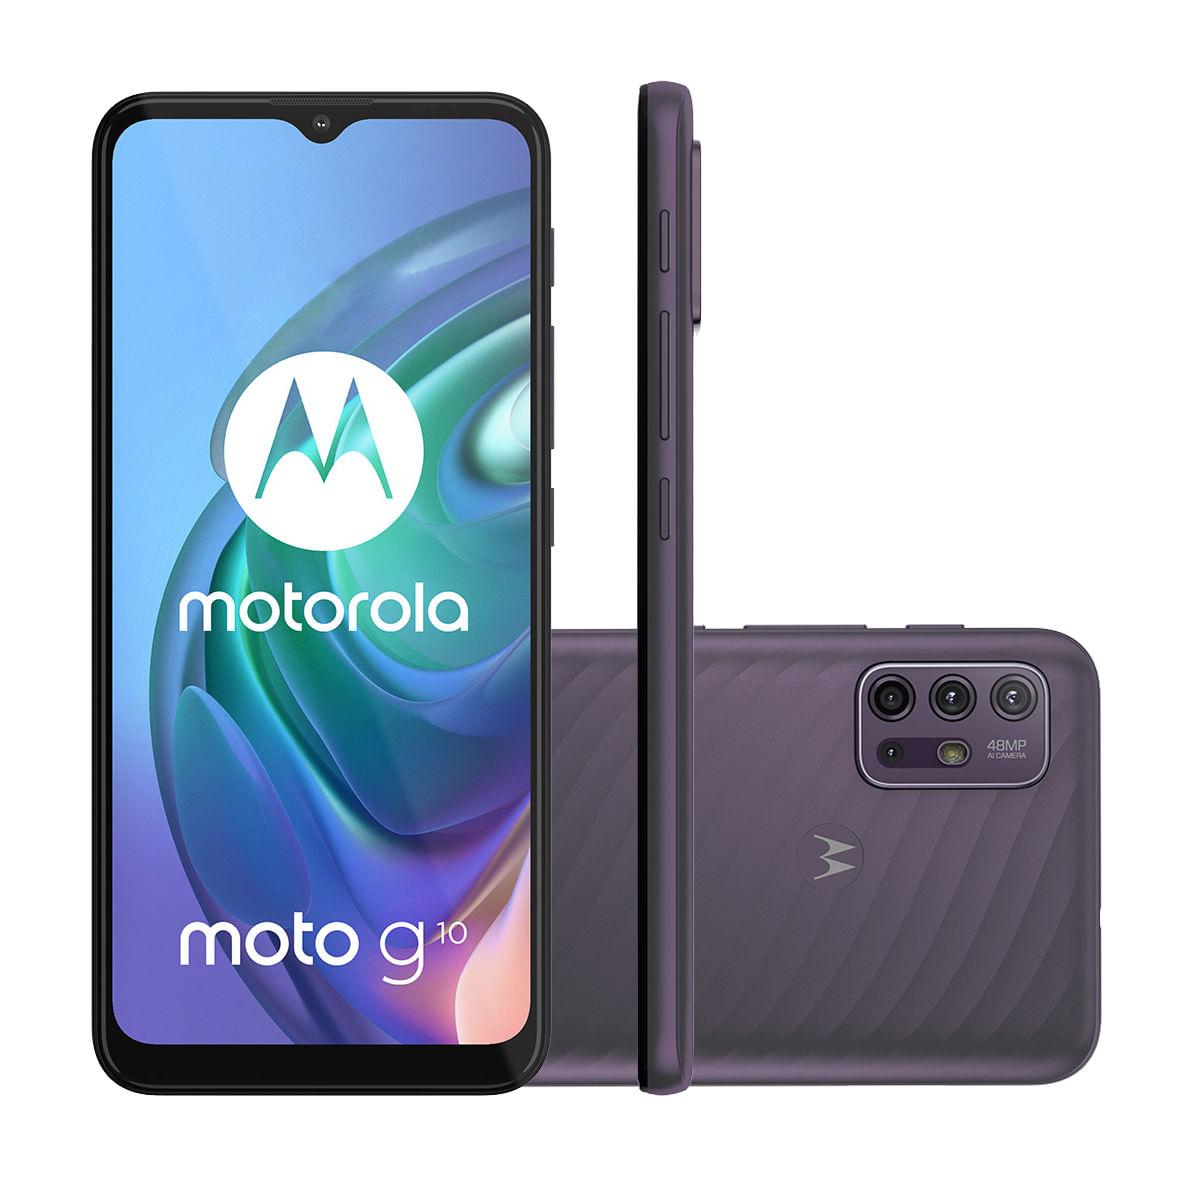 "Smartphone Motorola Moto G10 64GB Cinza Aurora 4G Tela 6.5"" Câmera Tripla 48MP Selfie 8MP Android 11"